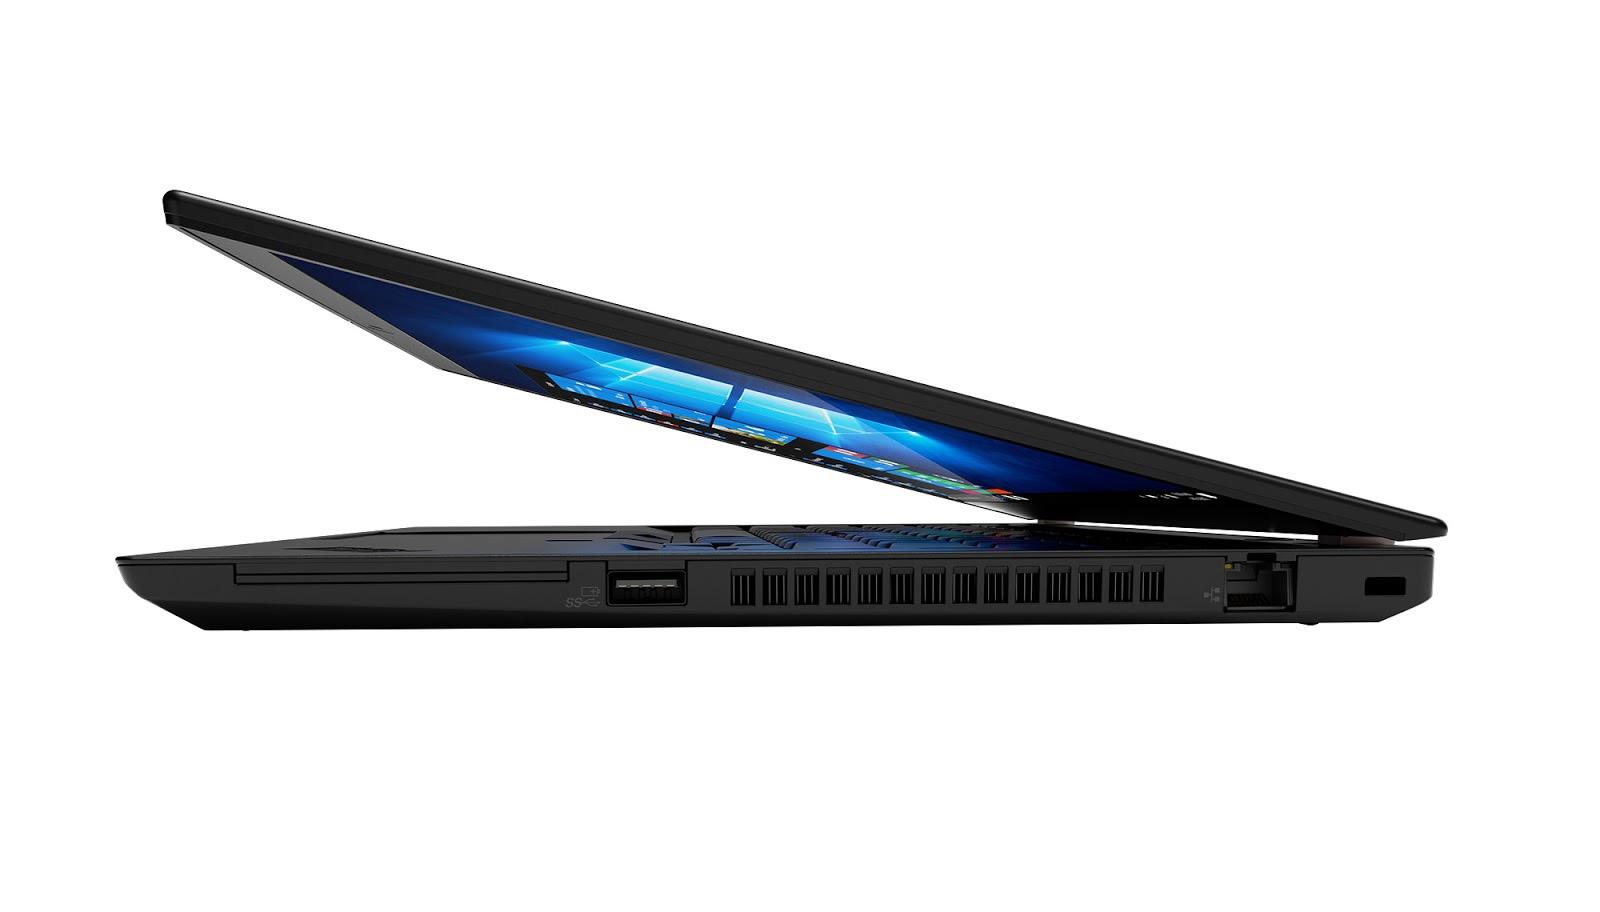 Фото 2. Ноутбук Lenovo ThinkPad T14 Gen 1 Black (20S00012RT)